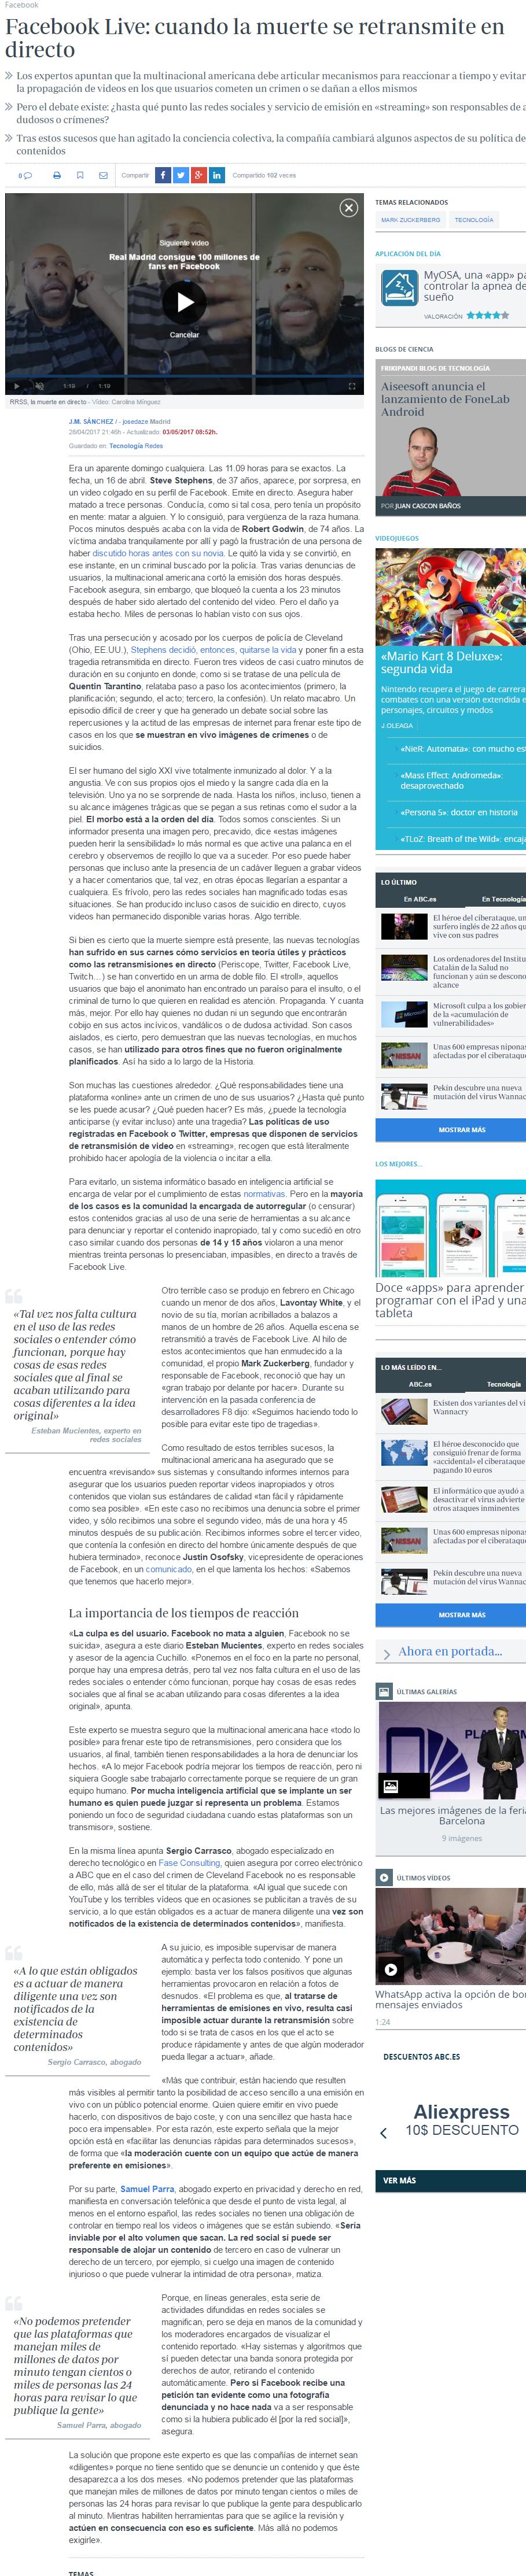 fireshot-capture-26-facebook_-facebook-live_-cuando-la-mue_-http___www-abc-es_tecnologia_redes